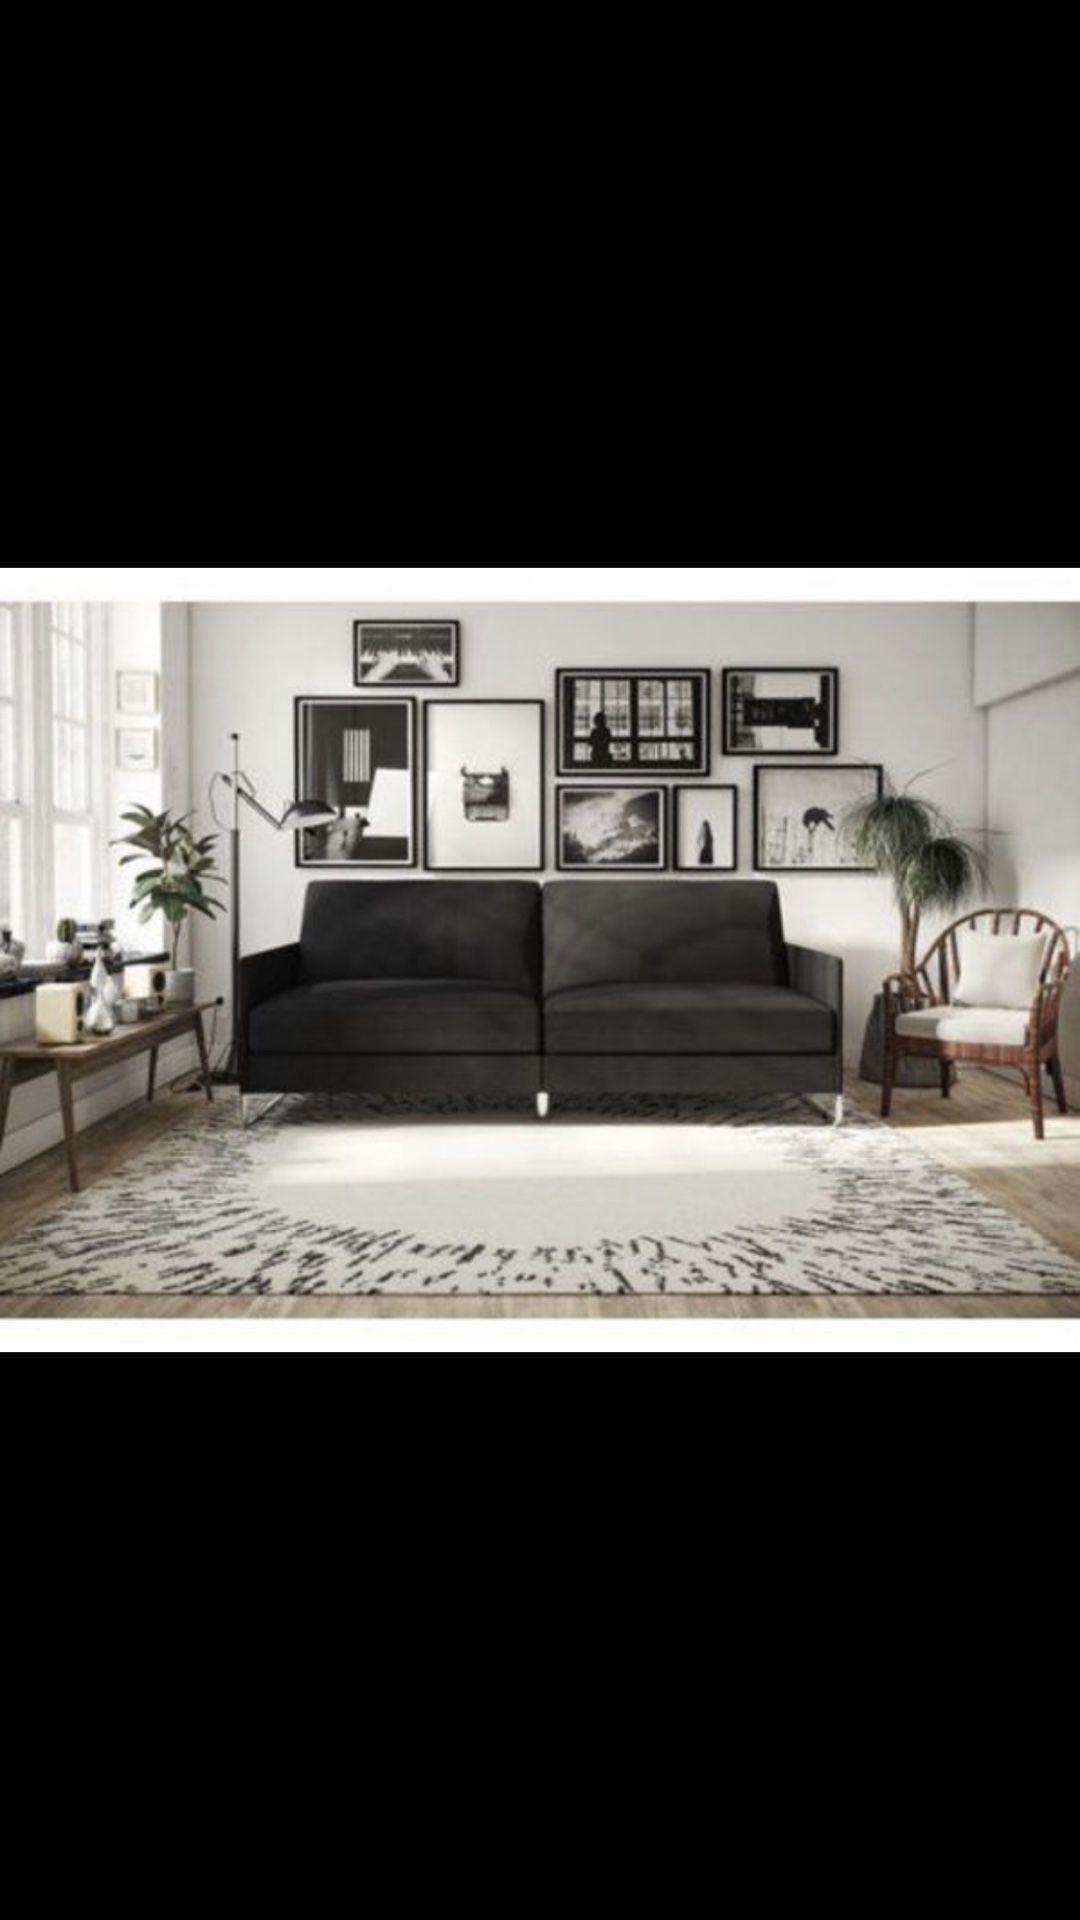 Grey Linen Sofa Futon (Fathers Day Special!) jM $125 Ends Jun.15th